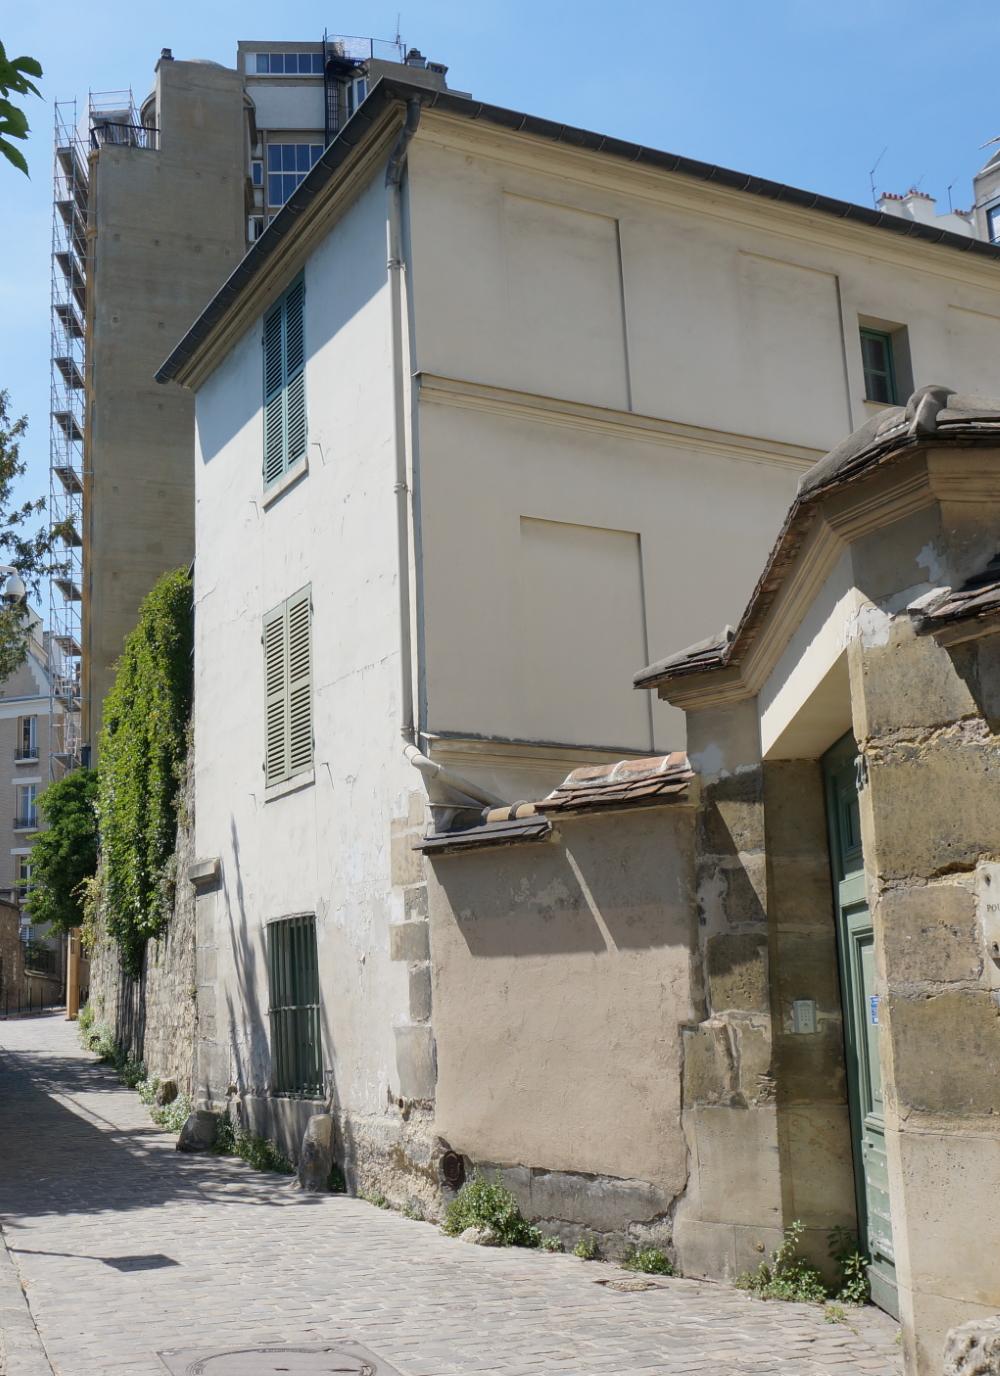 2020, ibidem.xyz ,Maison de Balzac – rue Berton,24, rue Berton,Paris,France